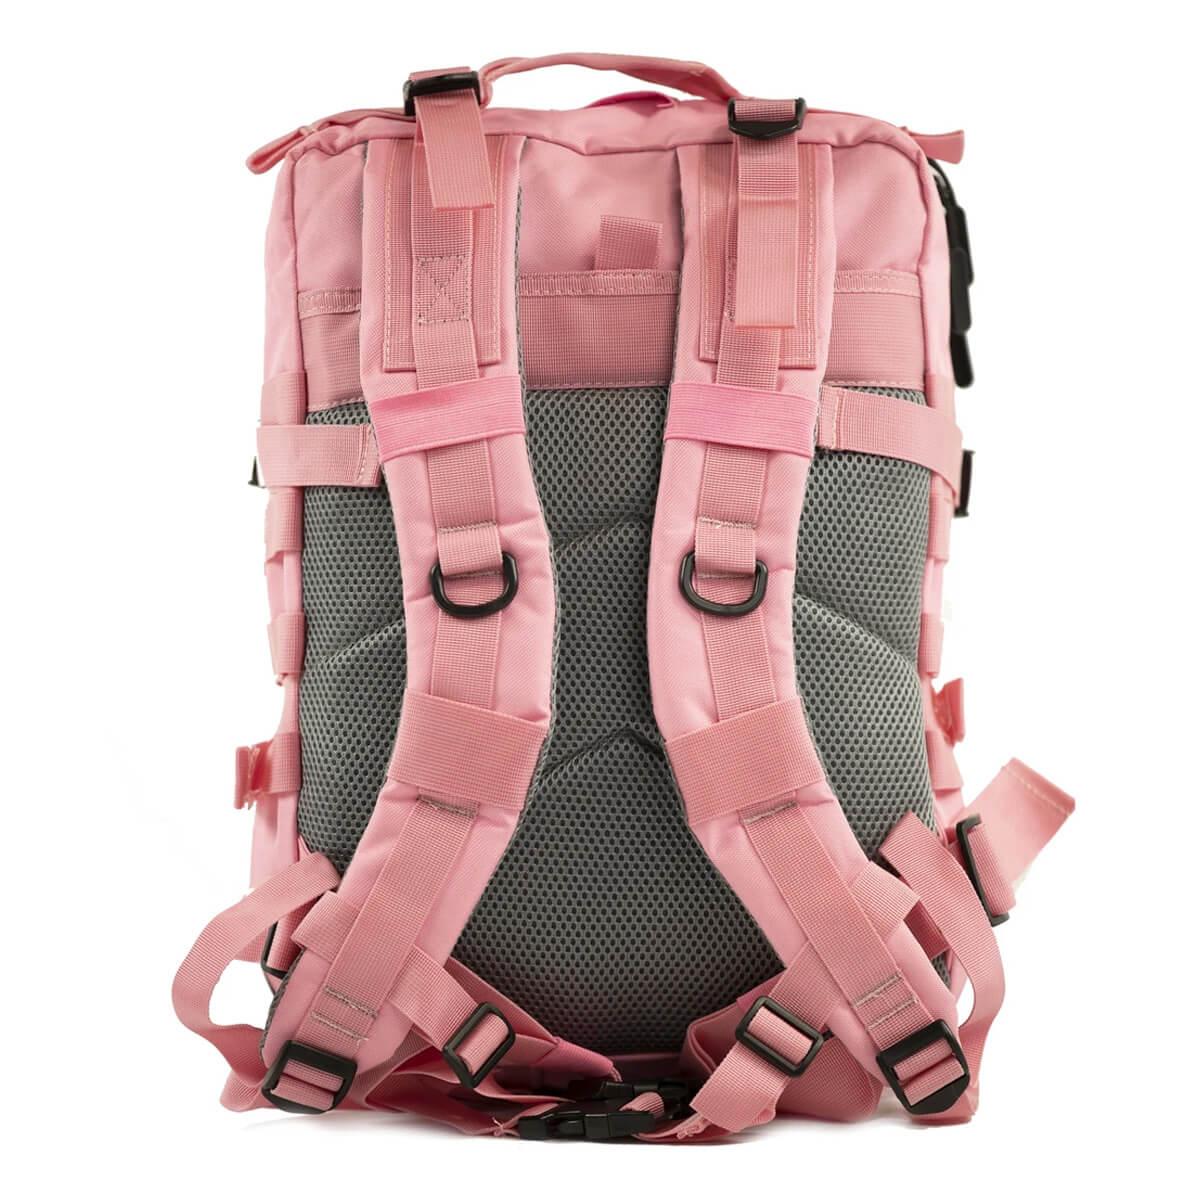 thumbnail 7 - Modern Day Athlete Unisex 2021 MD25 Waterproof Gym Training Backpack Rucksack